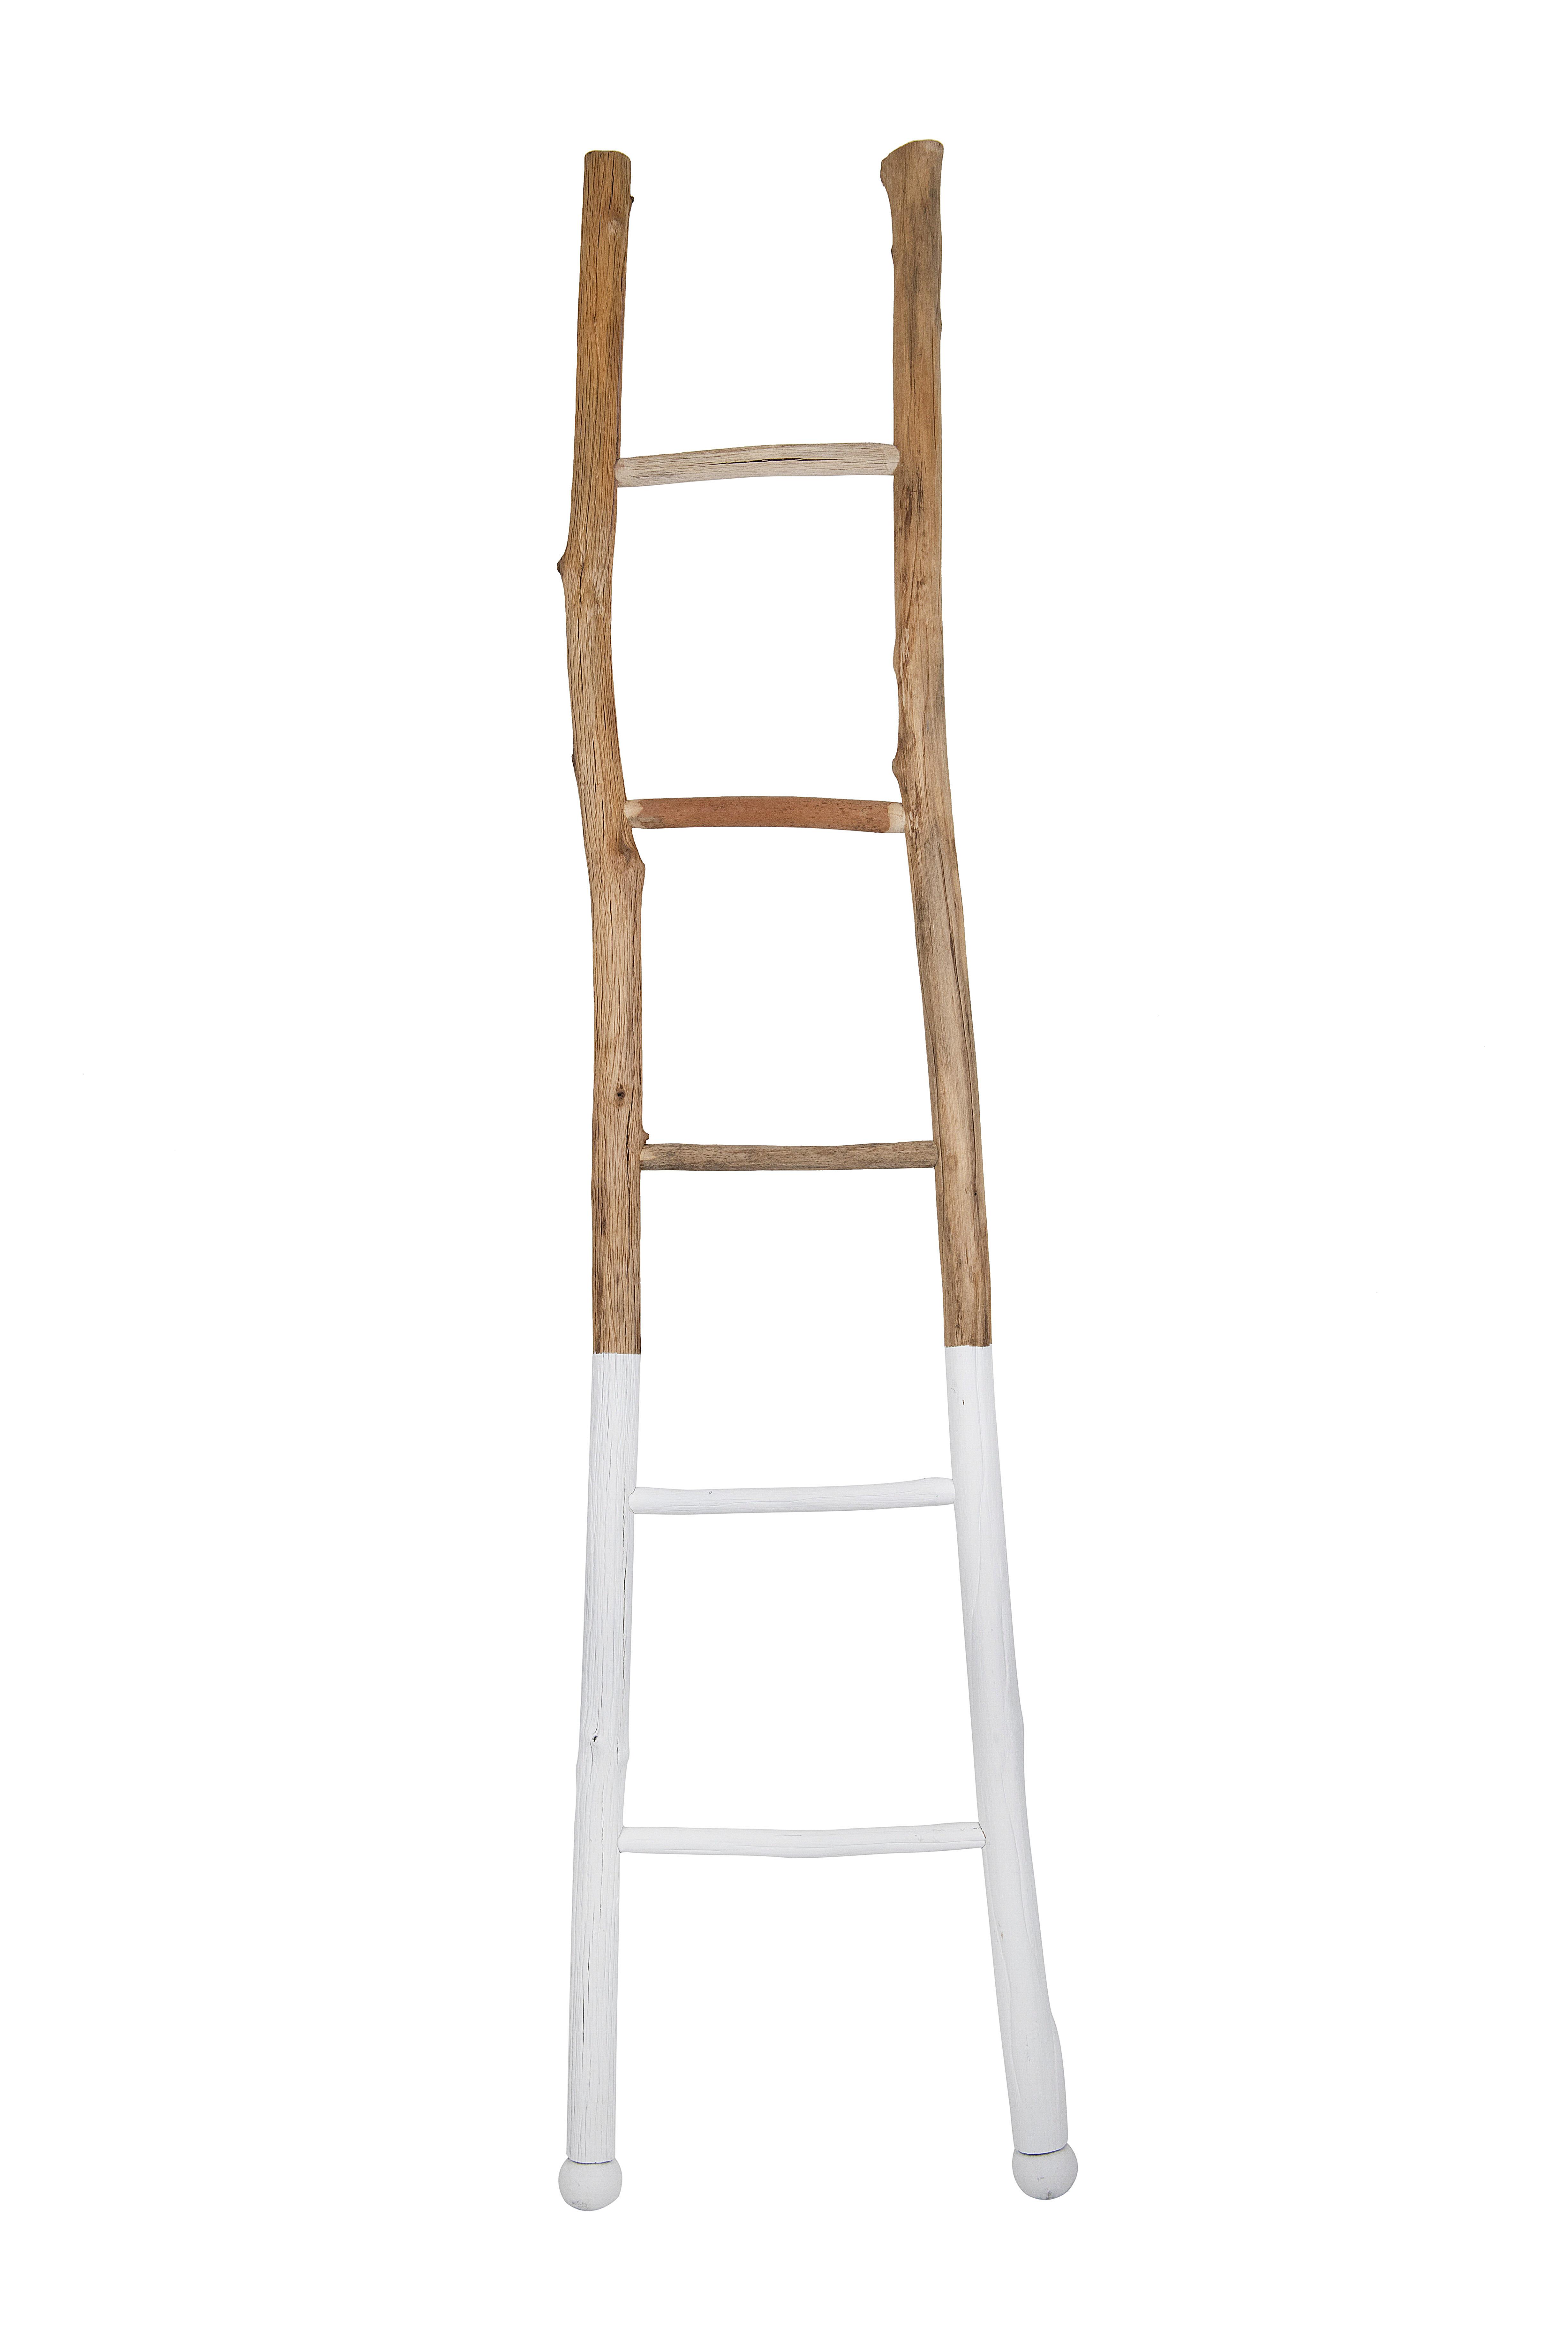 Wood 6 Ft Blanket Ladder Reviews Joss Main